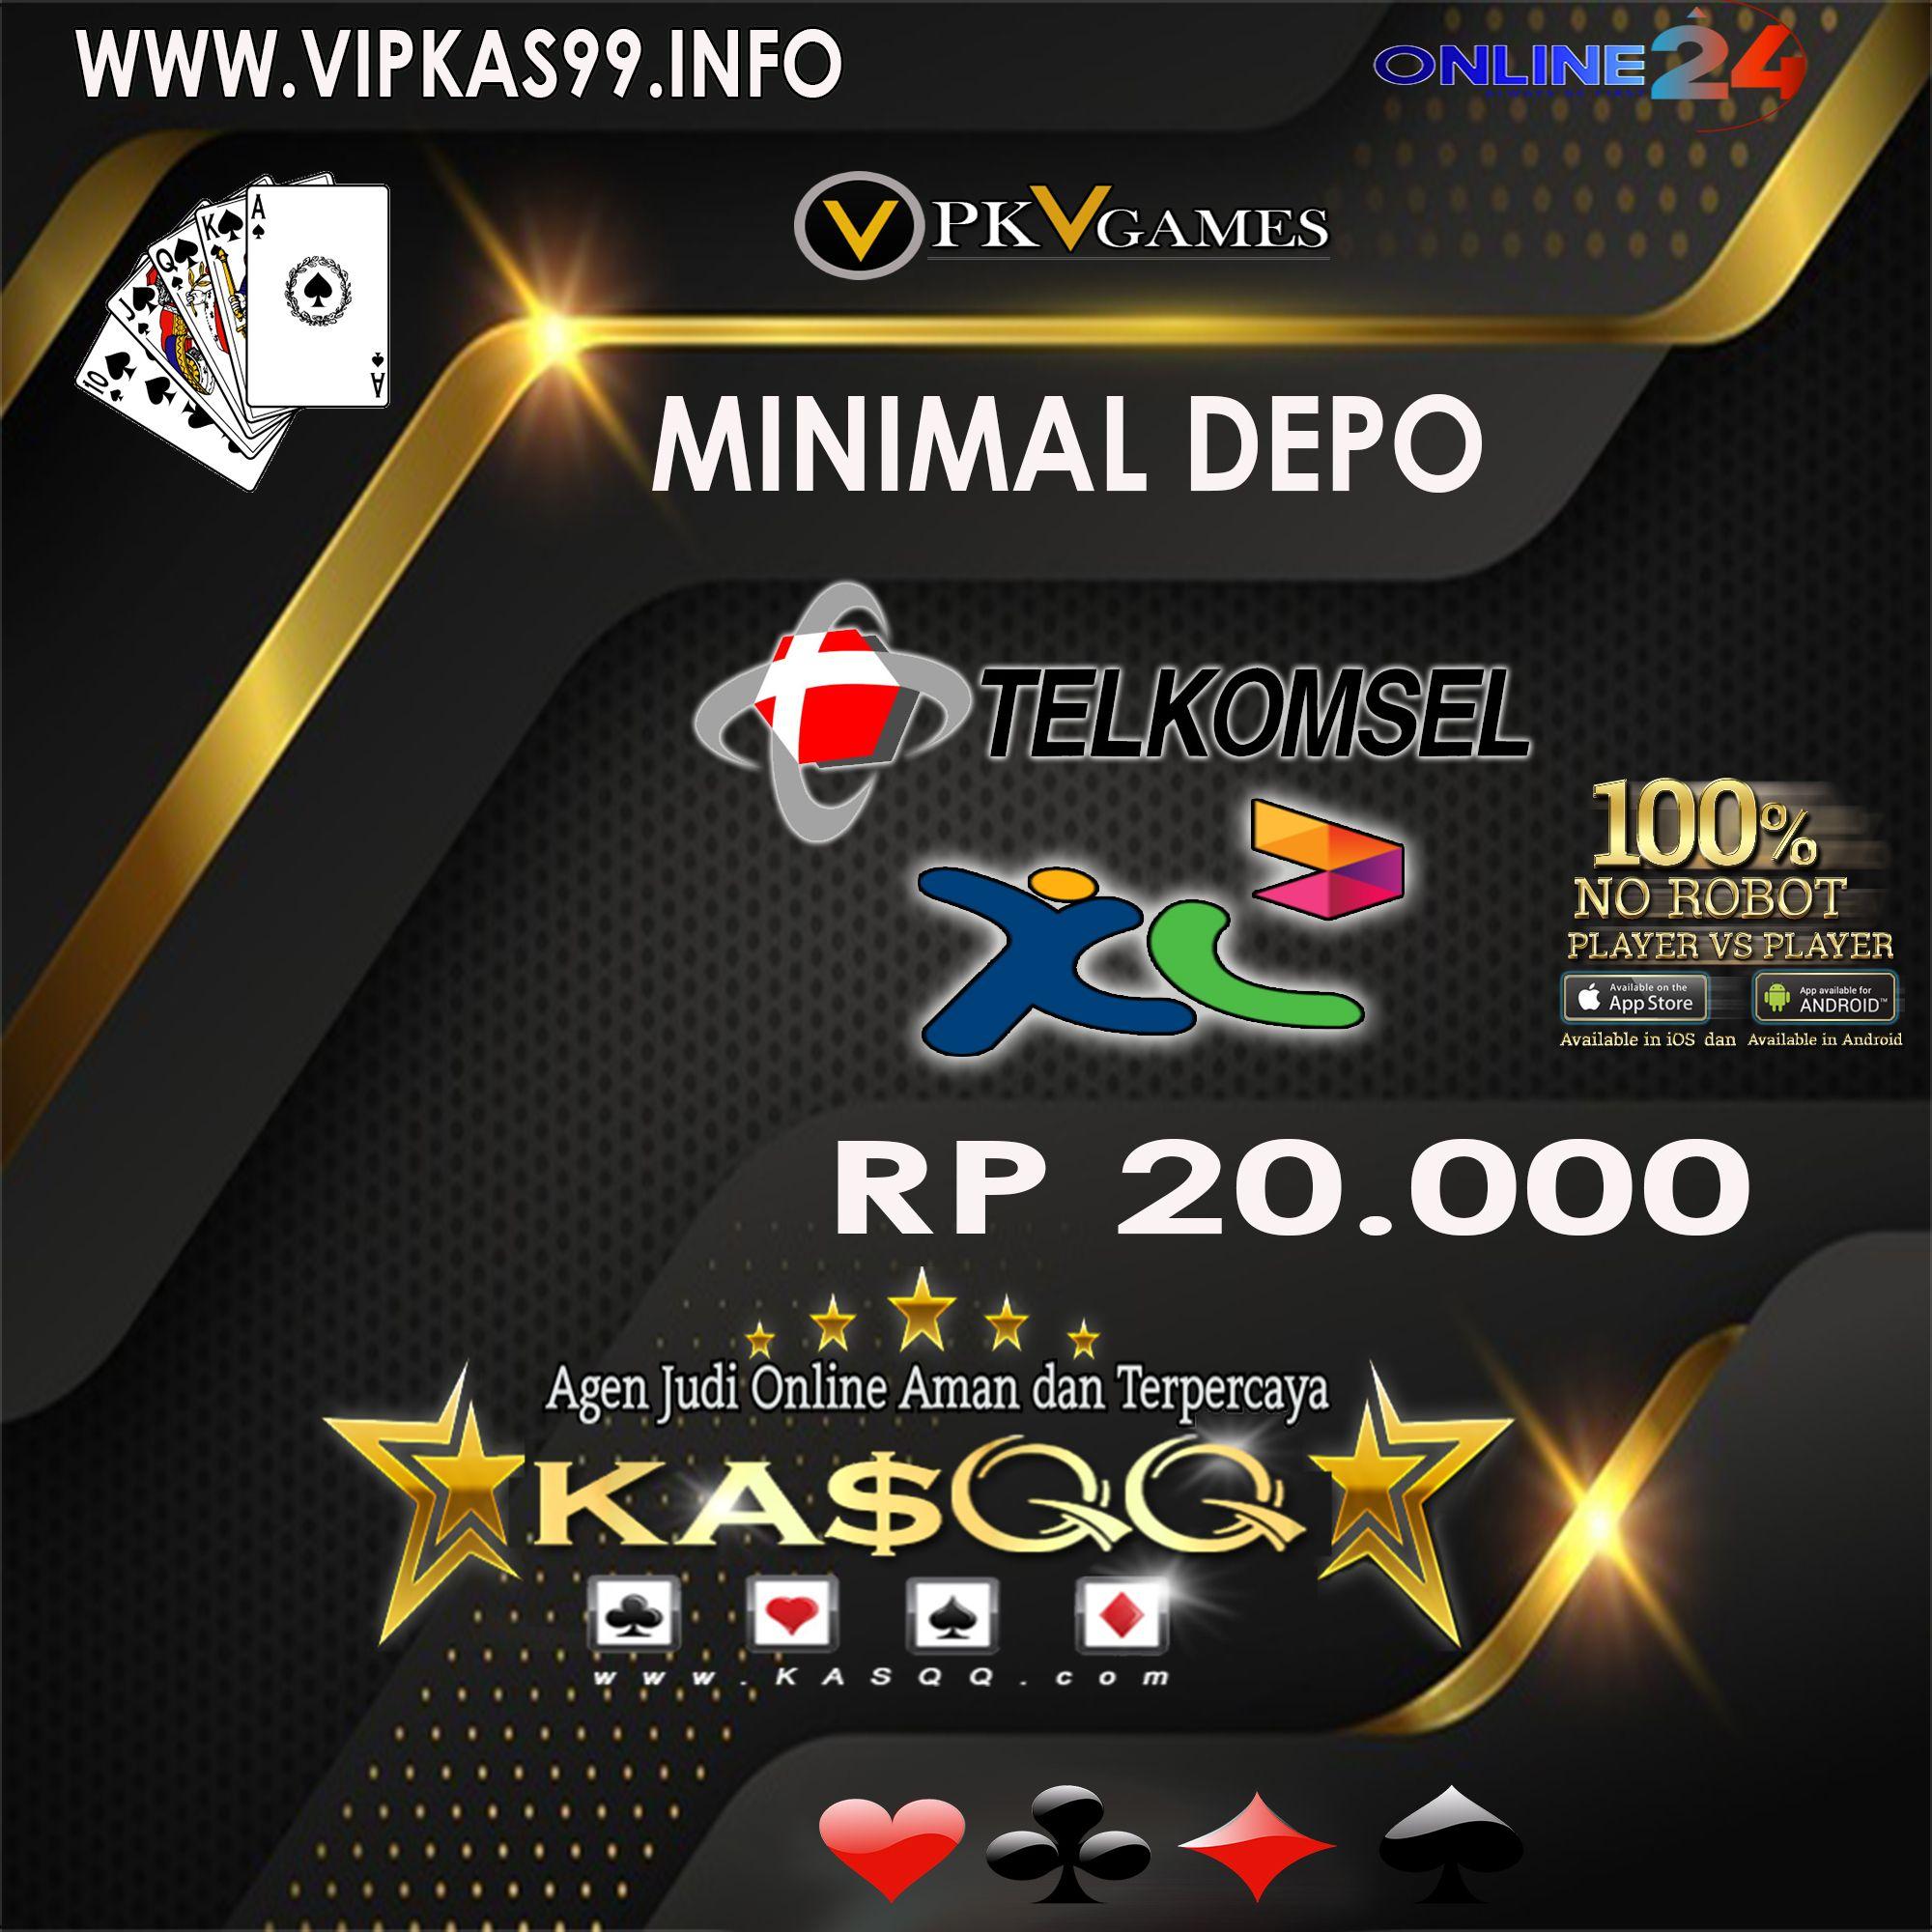 Vipkas99 Agen Bandarq Aman Dan Terpercaya 100 Mainan Uang Poker